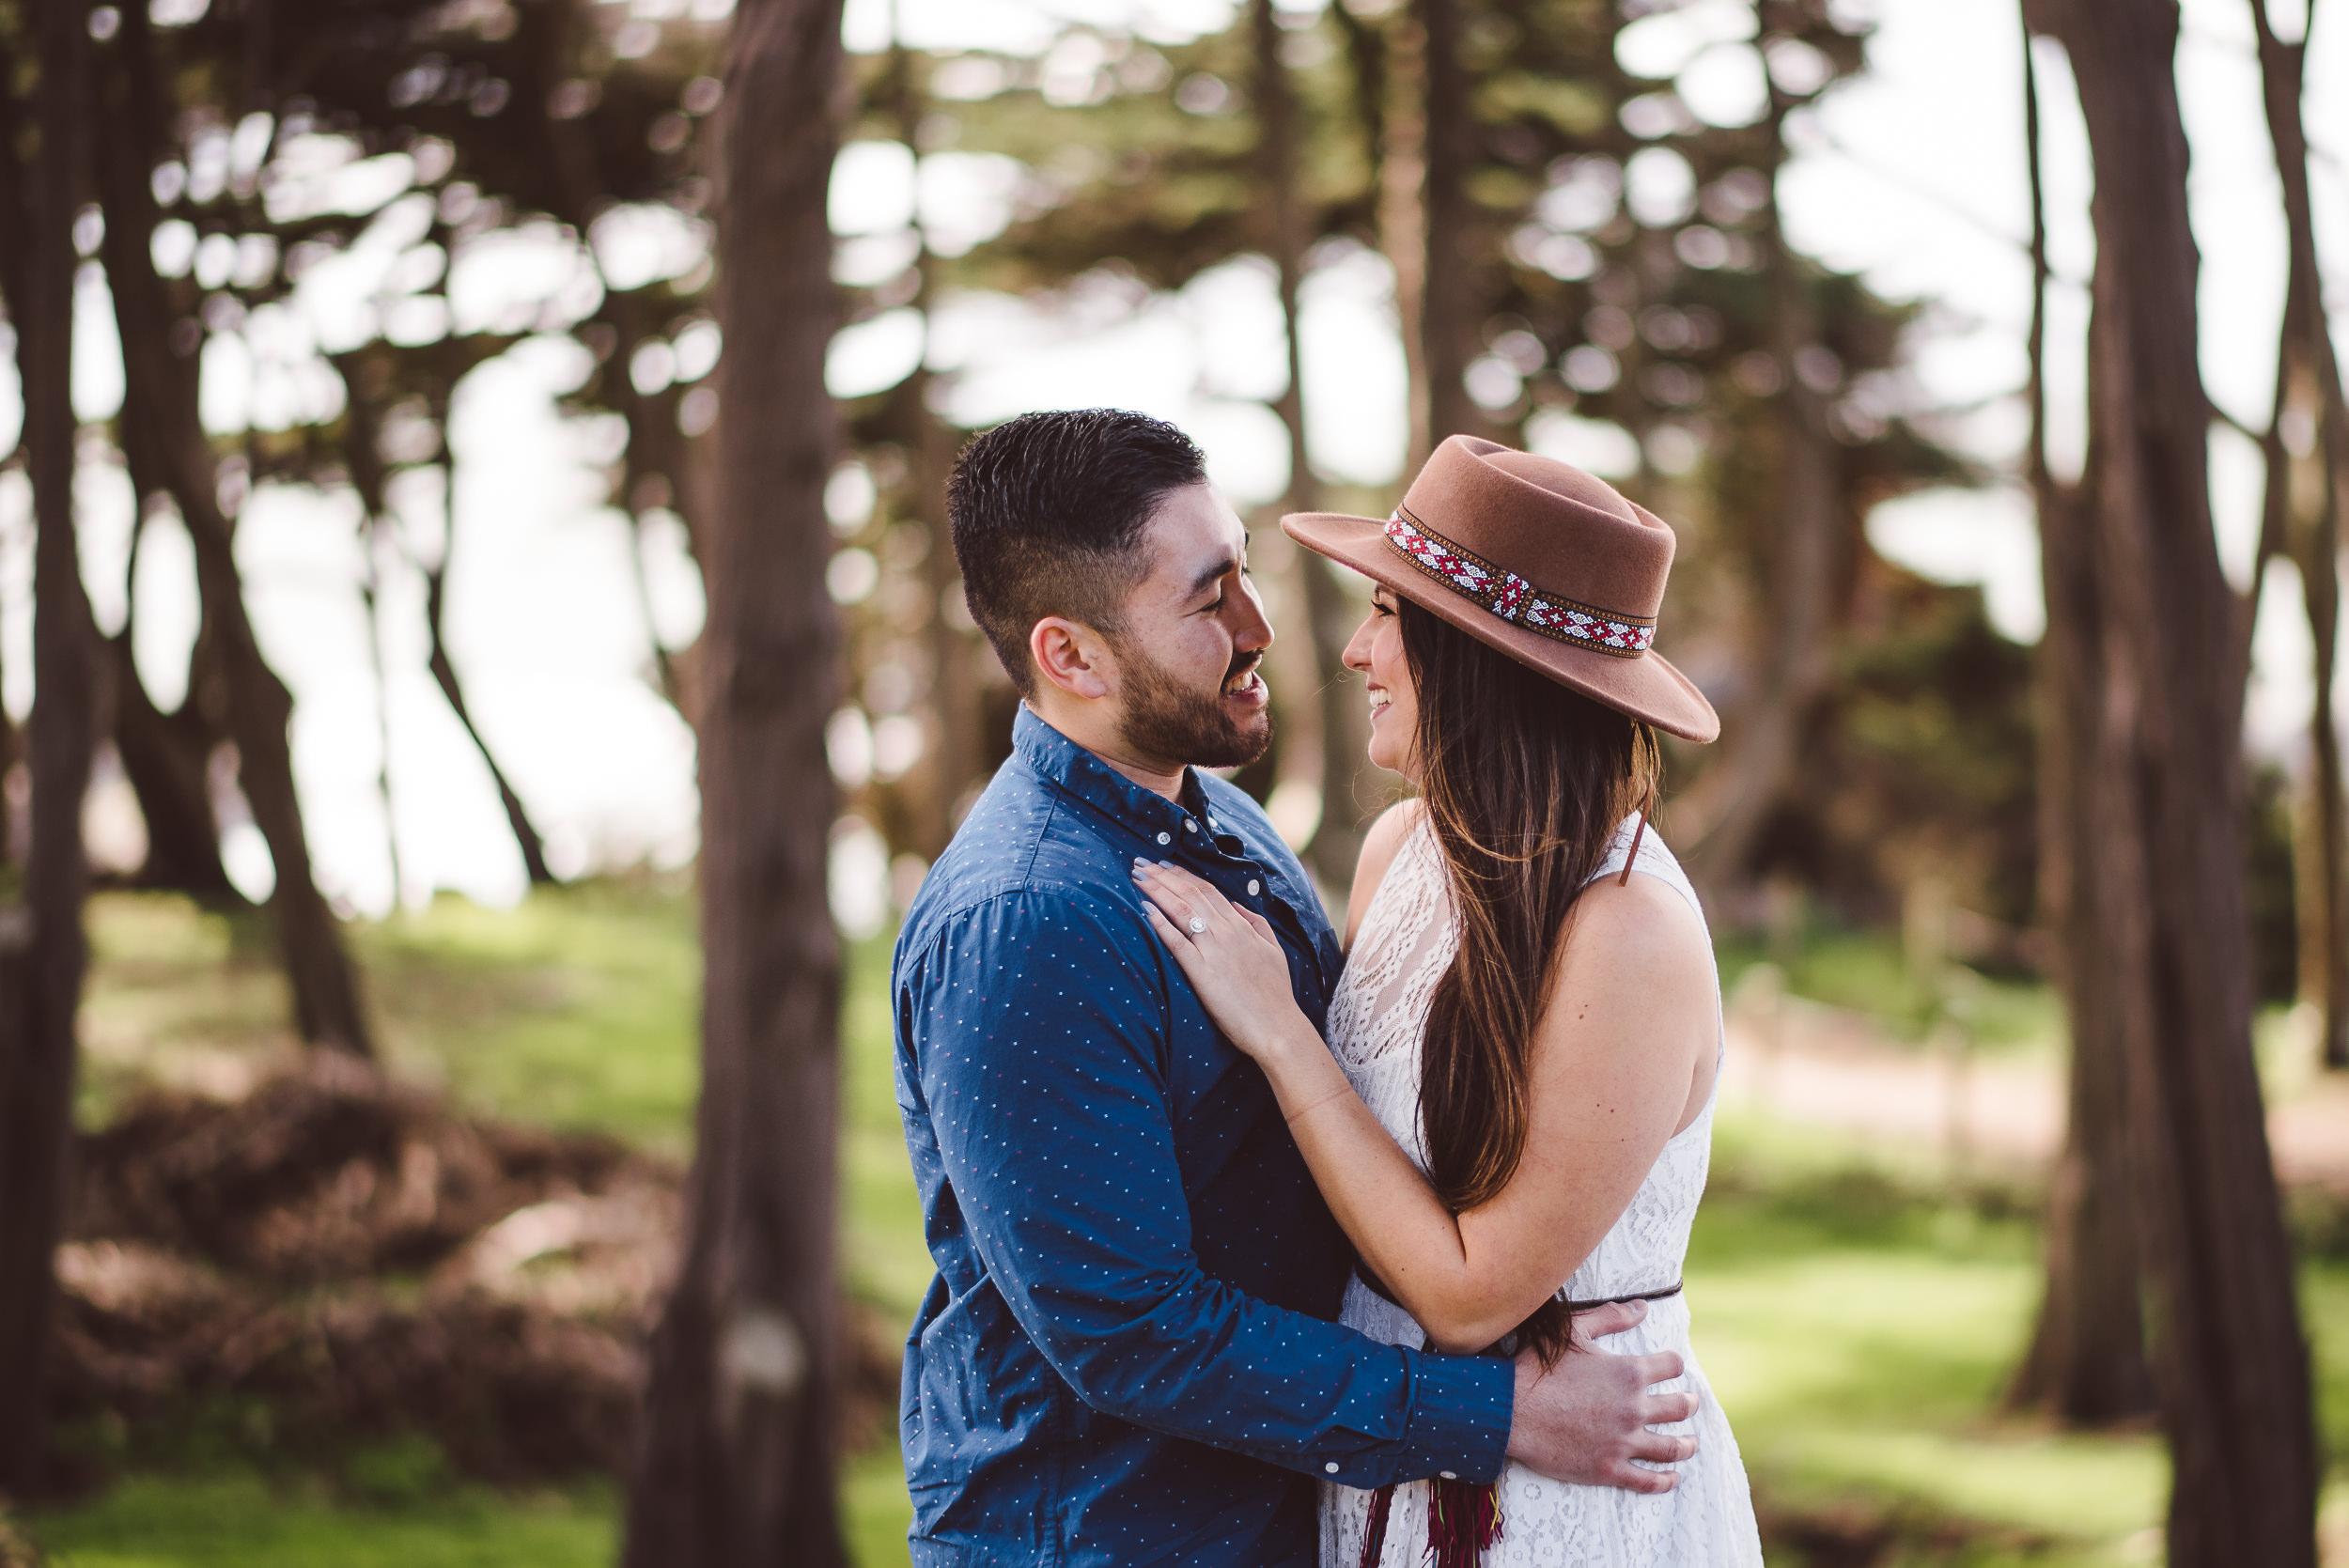 Lands-End-Sutro-Baths-San-Francisco-Engagement-Photography-002.jpg